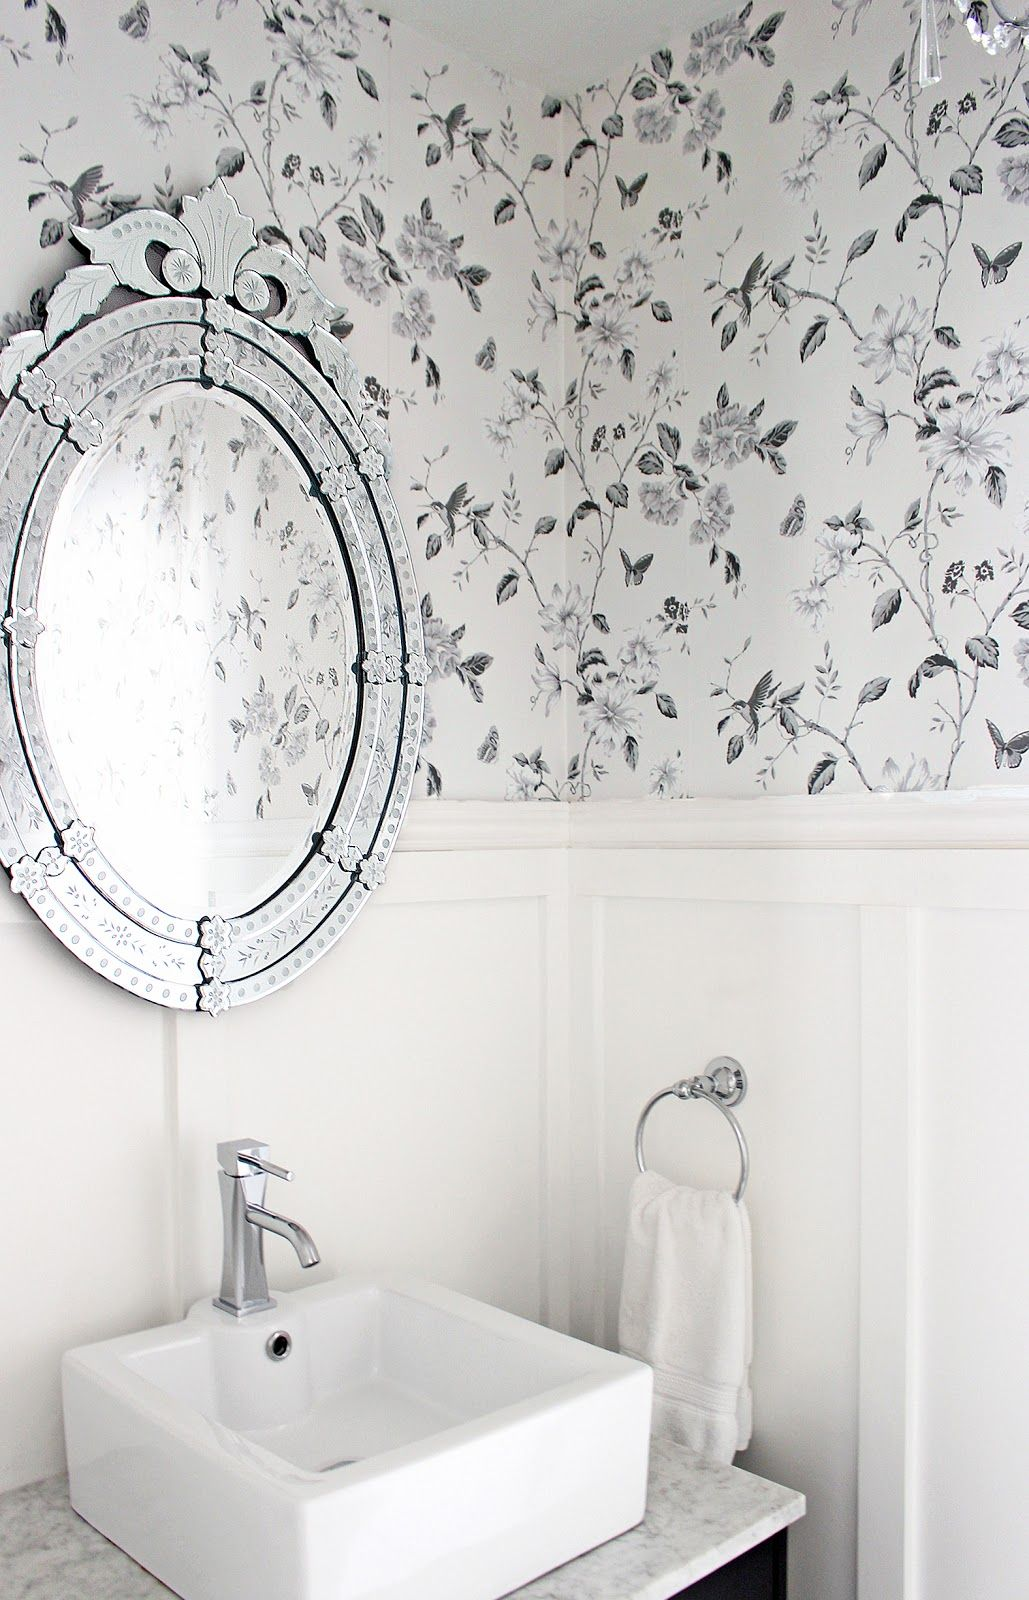 Bathroom wallpaper anthropologie smoky rose wallpaper charcoal